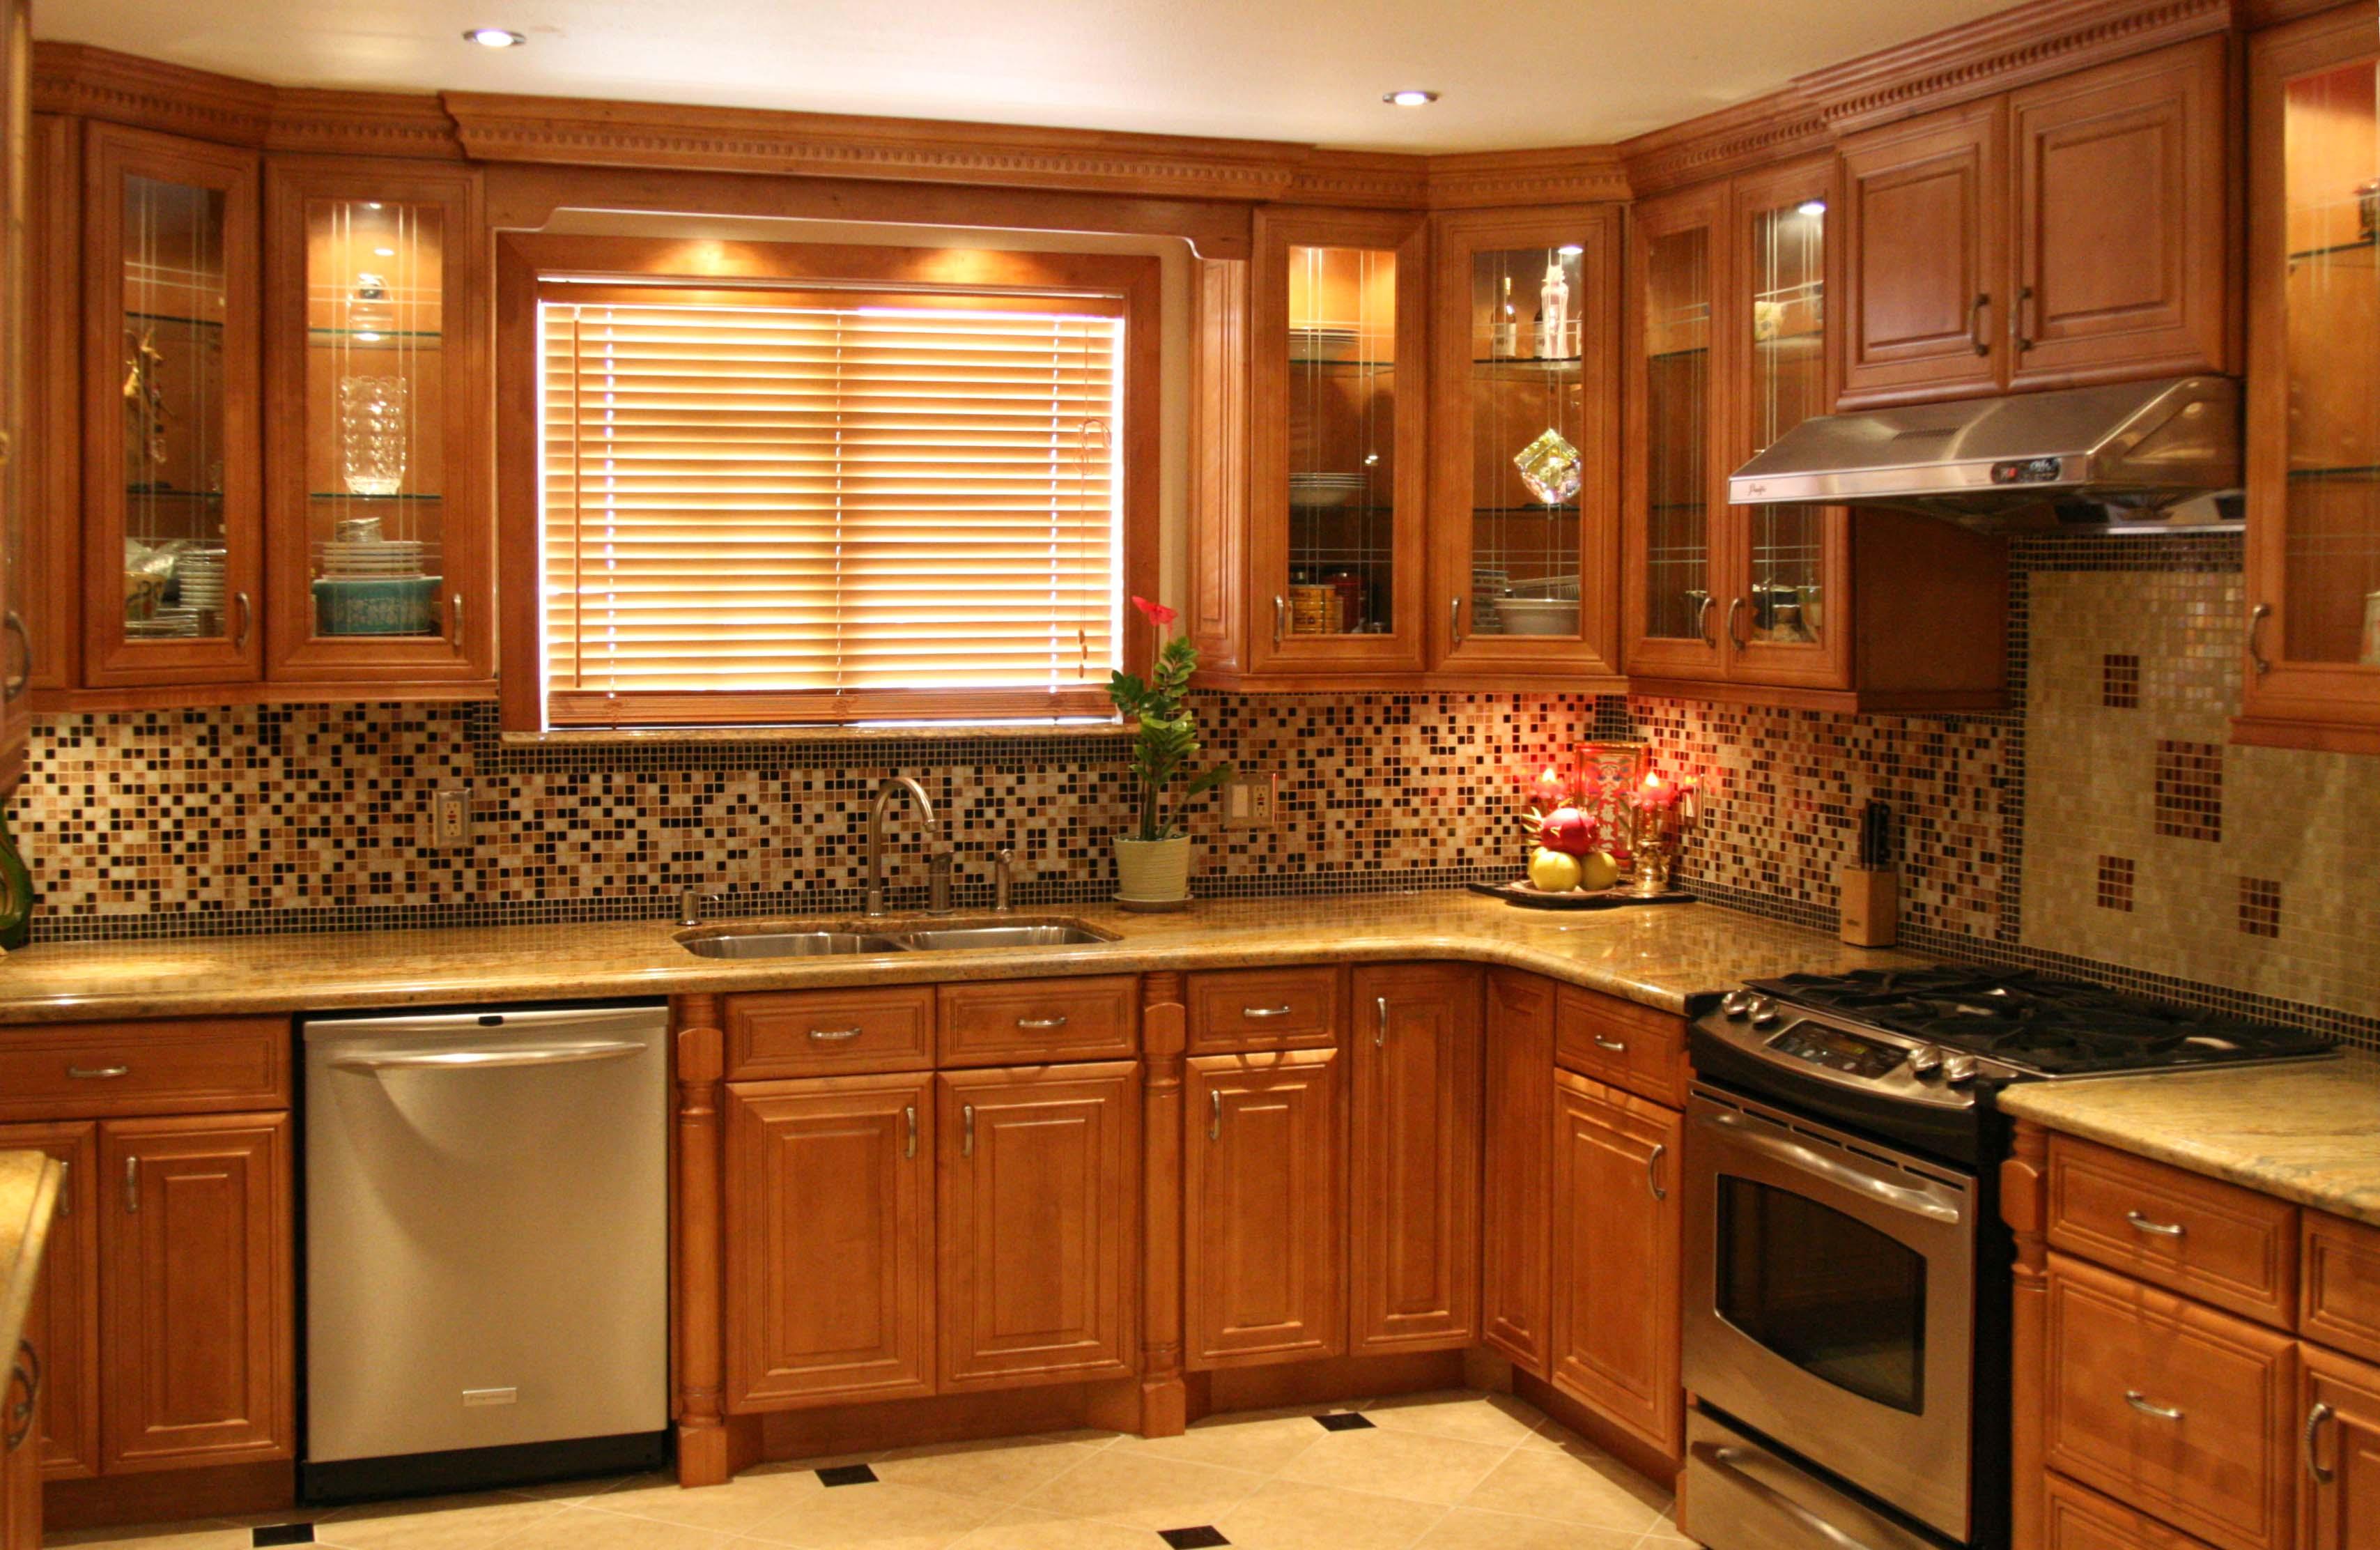 solid wood vs laminate kitchen cabinets wood kitchen cabinets Solid Wood vs Laminate Kitchen Cabinets